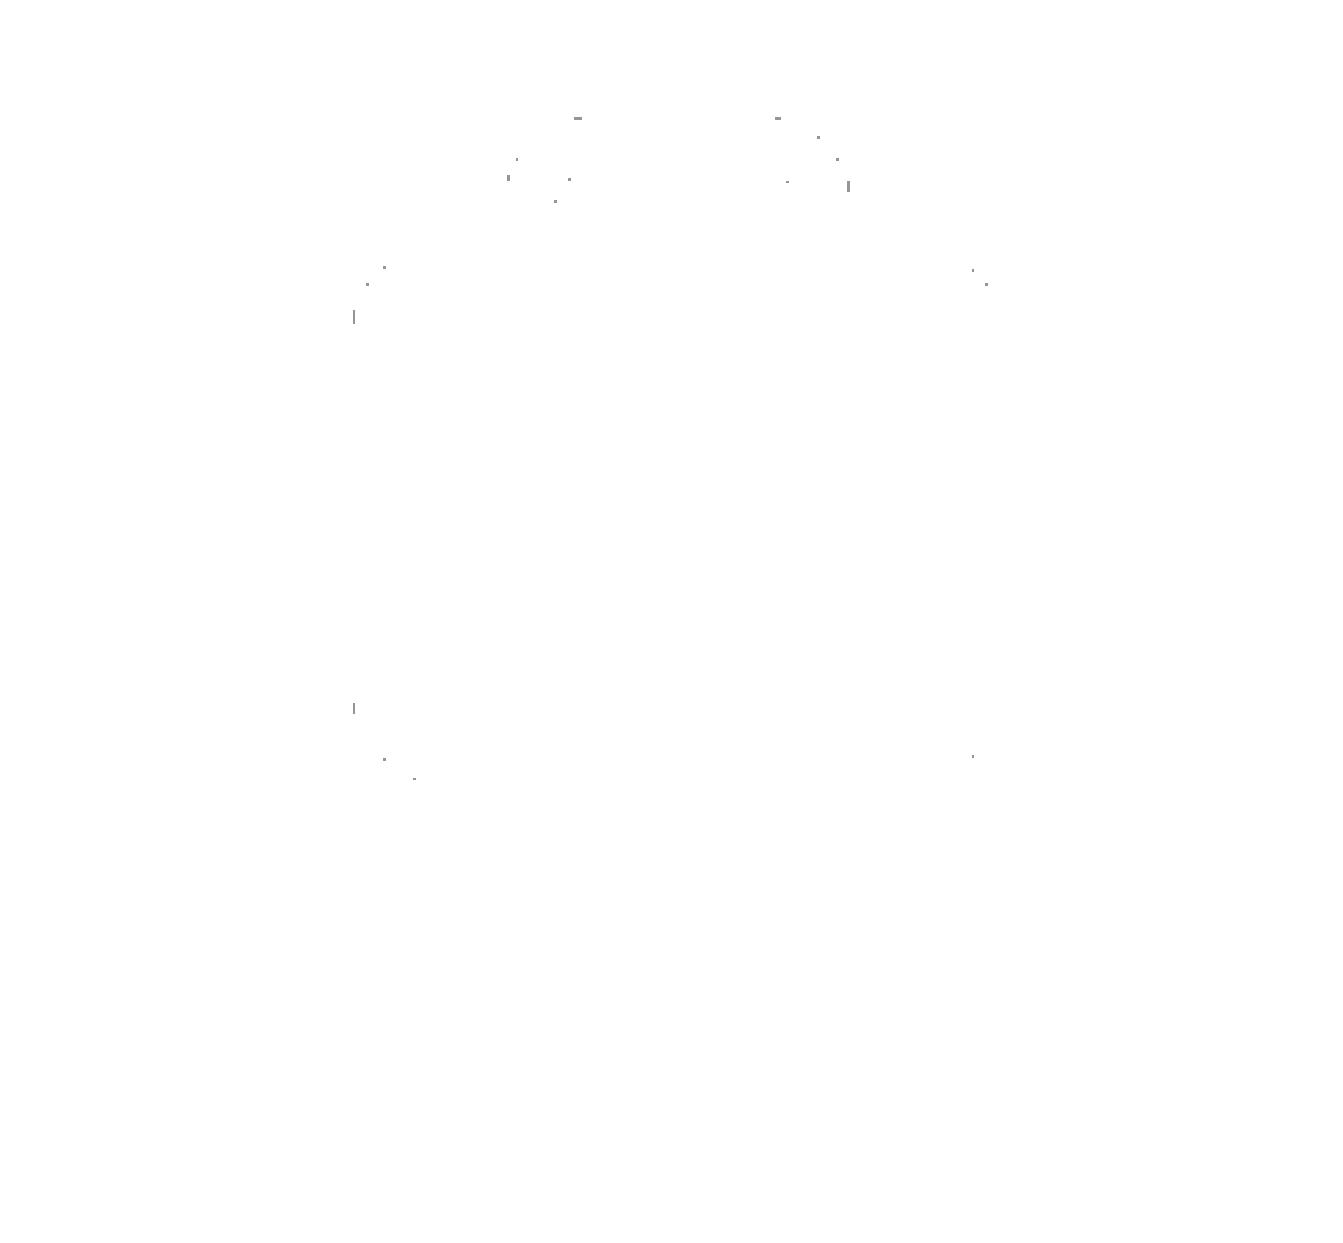 Emergency clipart typhoon preparedness. The survival fund build